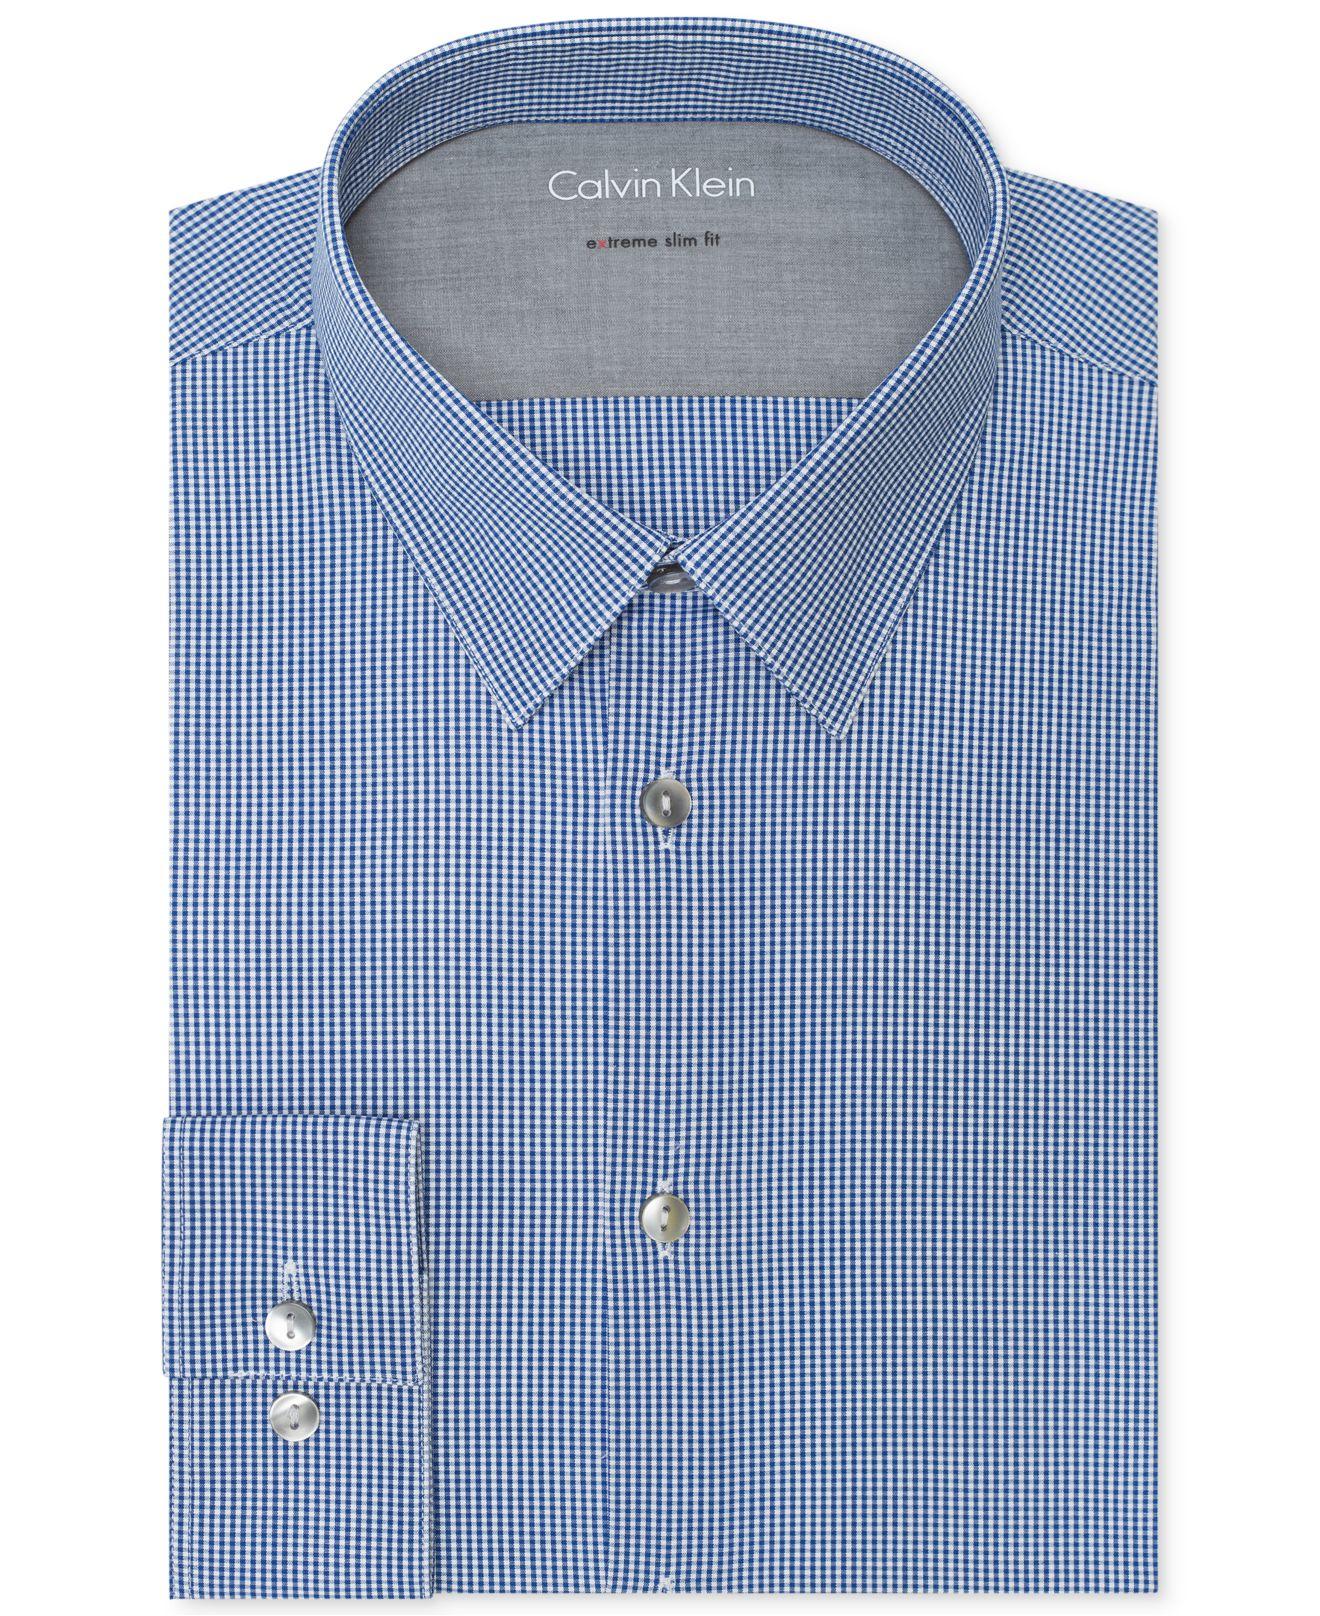 Calvin klein x extra slim fit gingham dress shirt in blue for Extra slim dress shirt